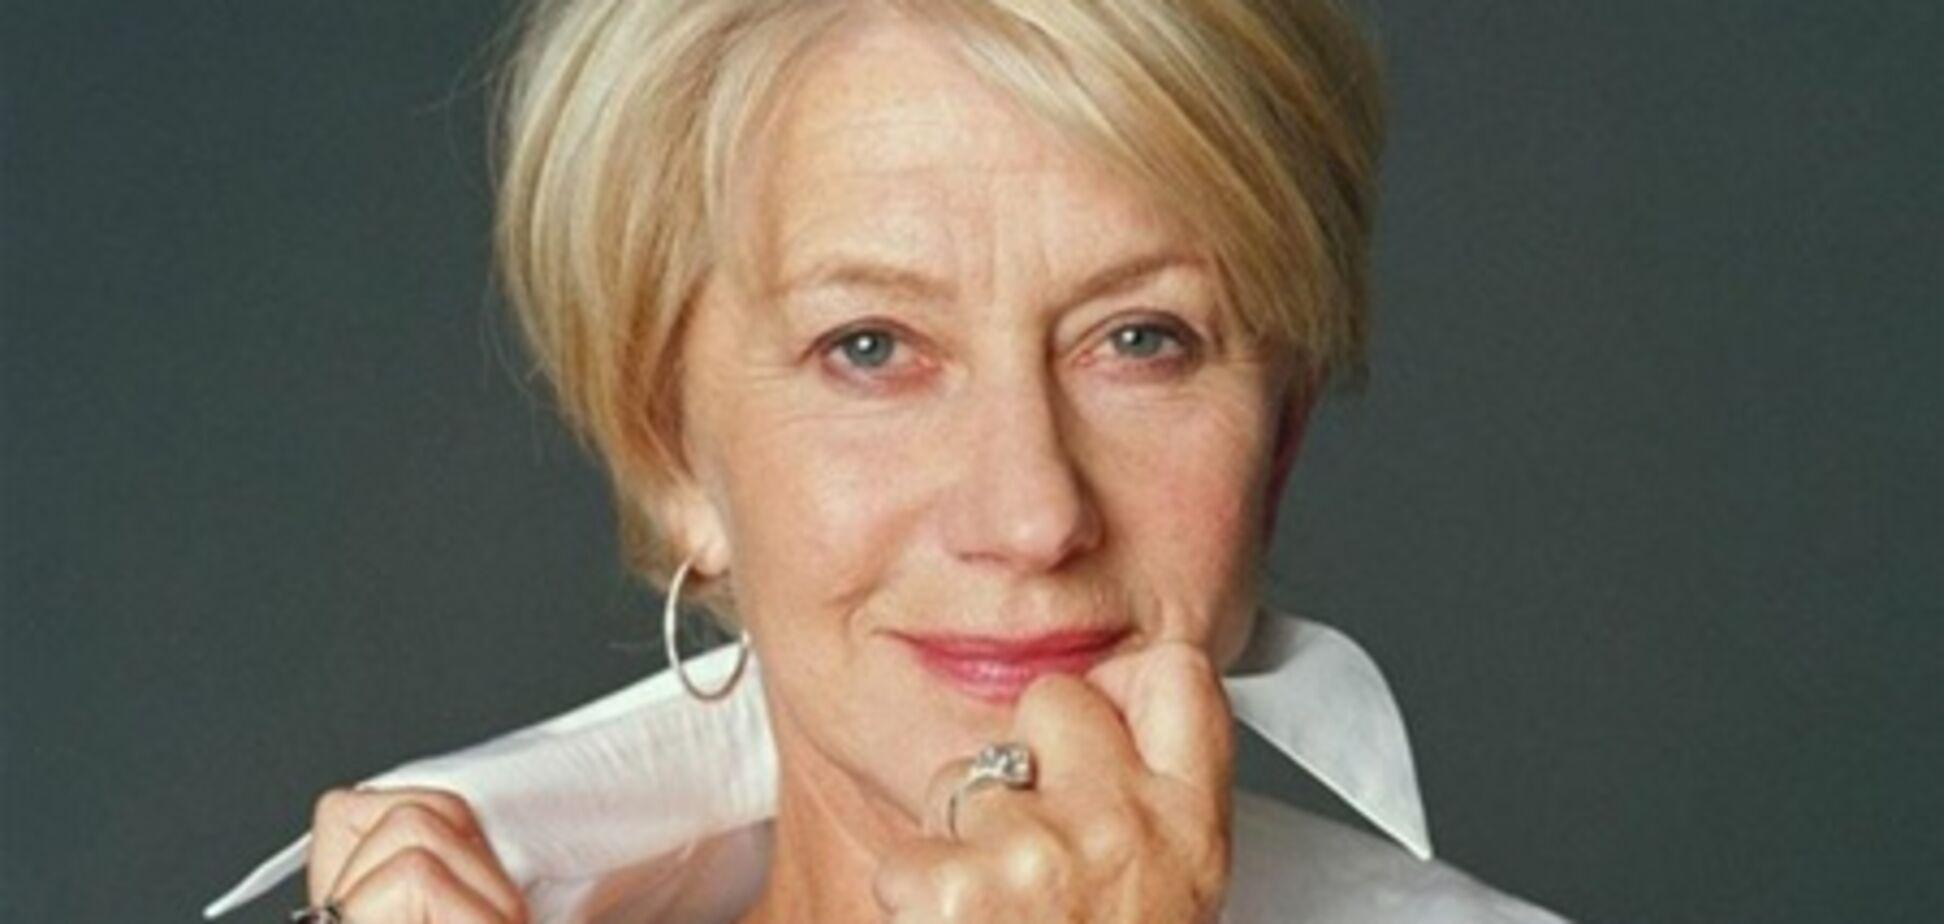 Вклад Хелен Миррен оценила киноакадемия